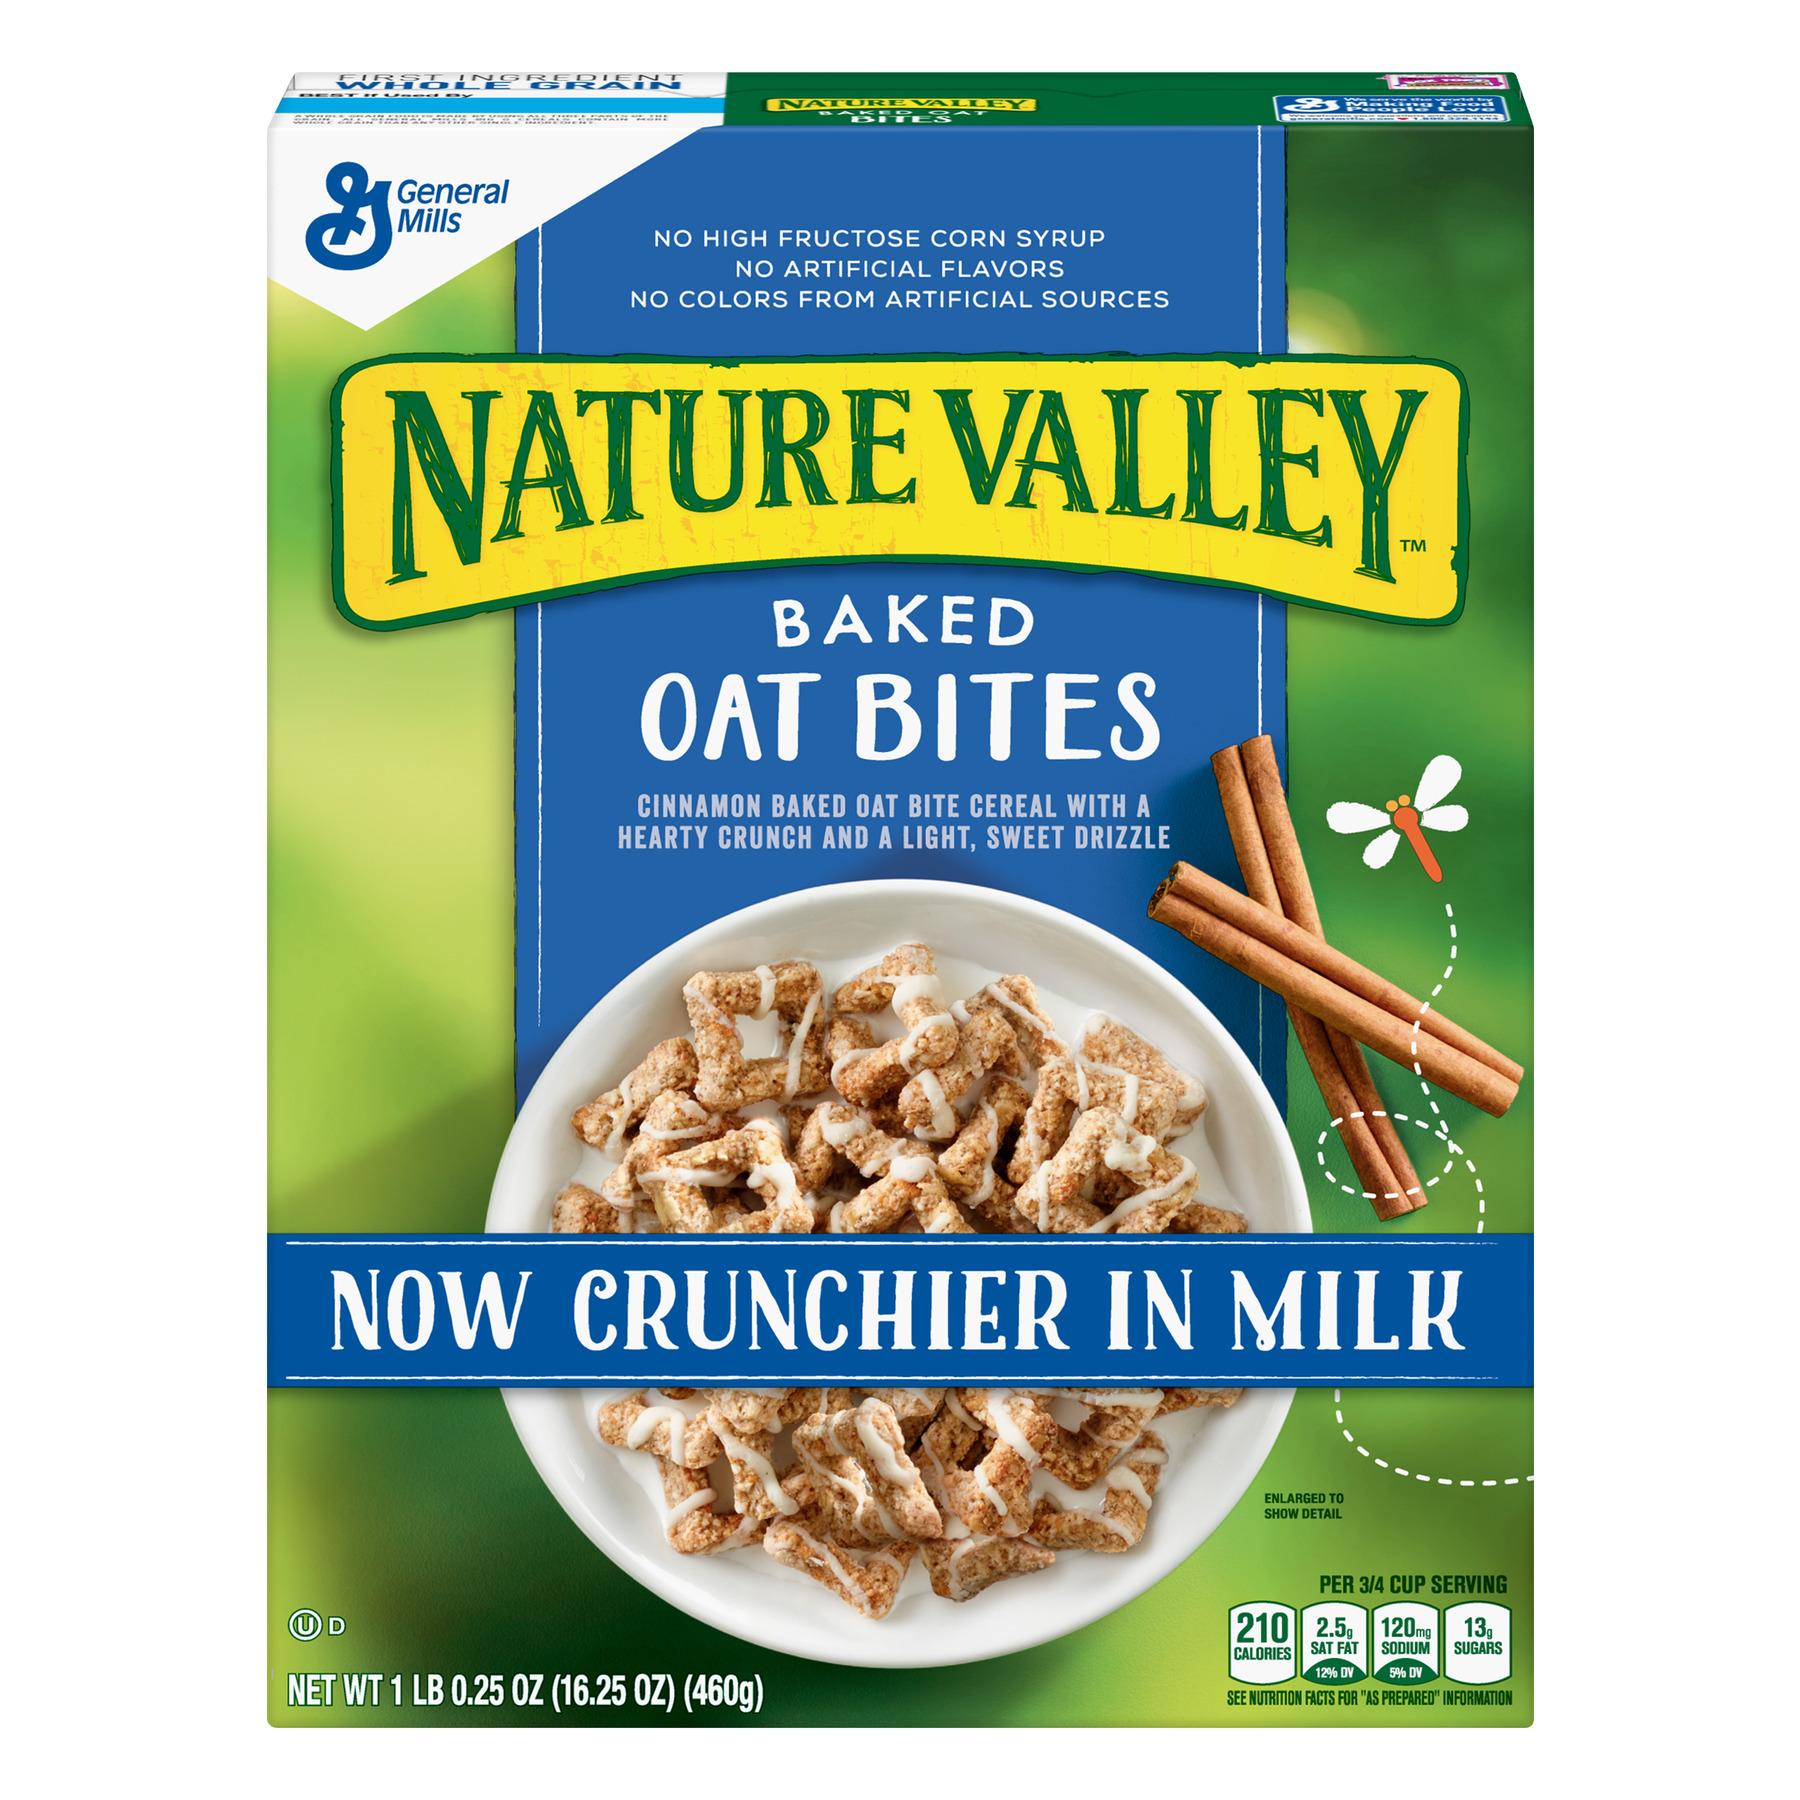 Nature Valley Cereal, Baked Oat Bites, 16.25 oz